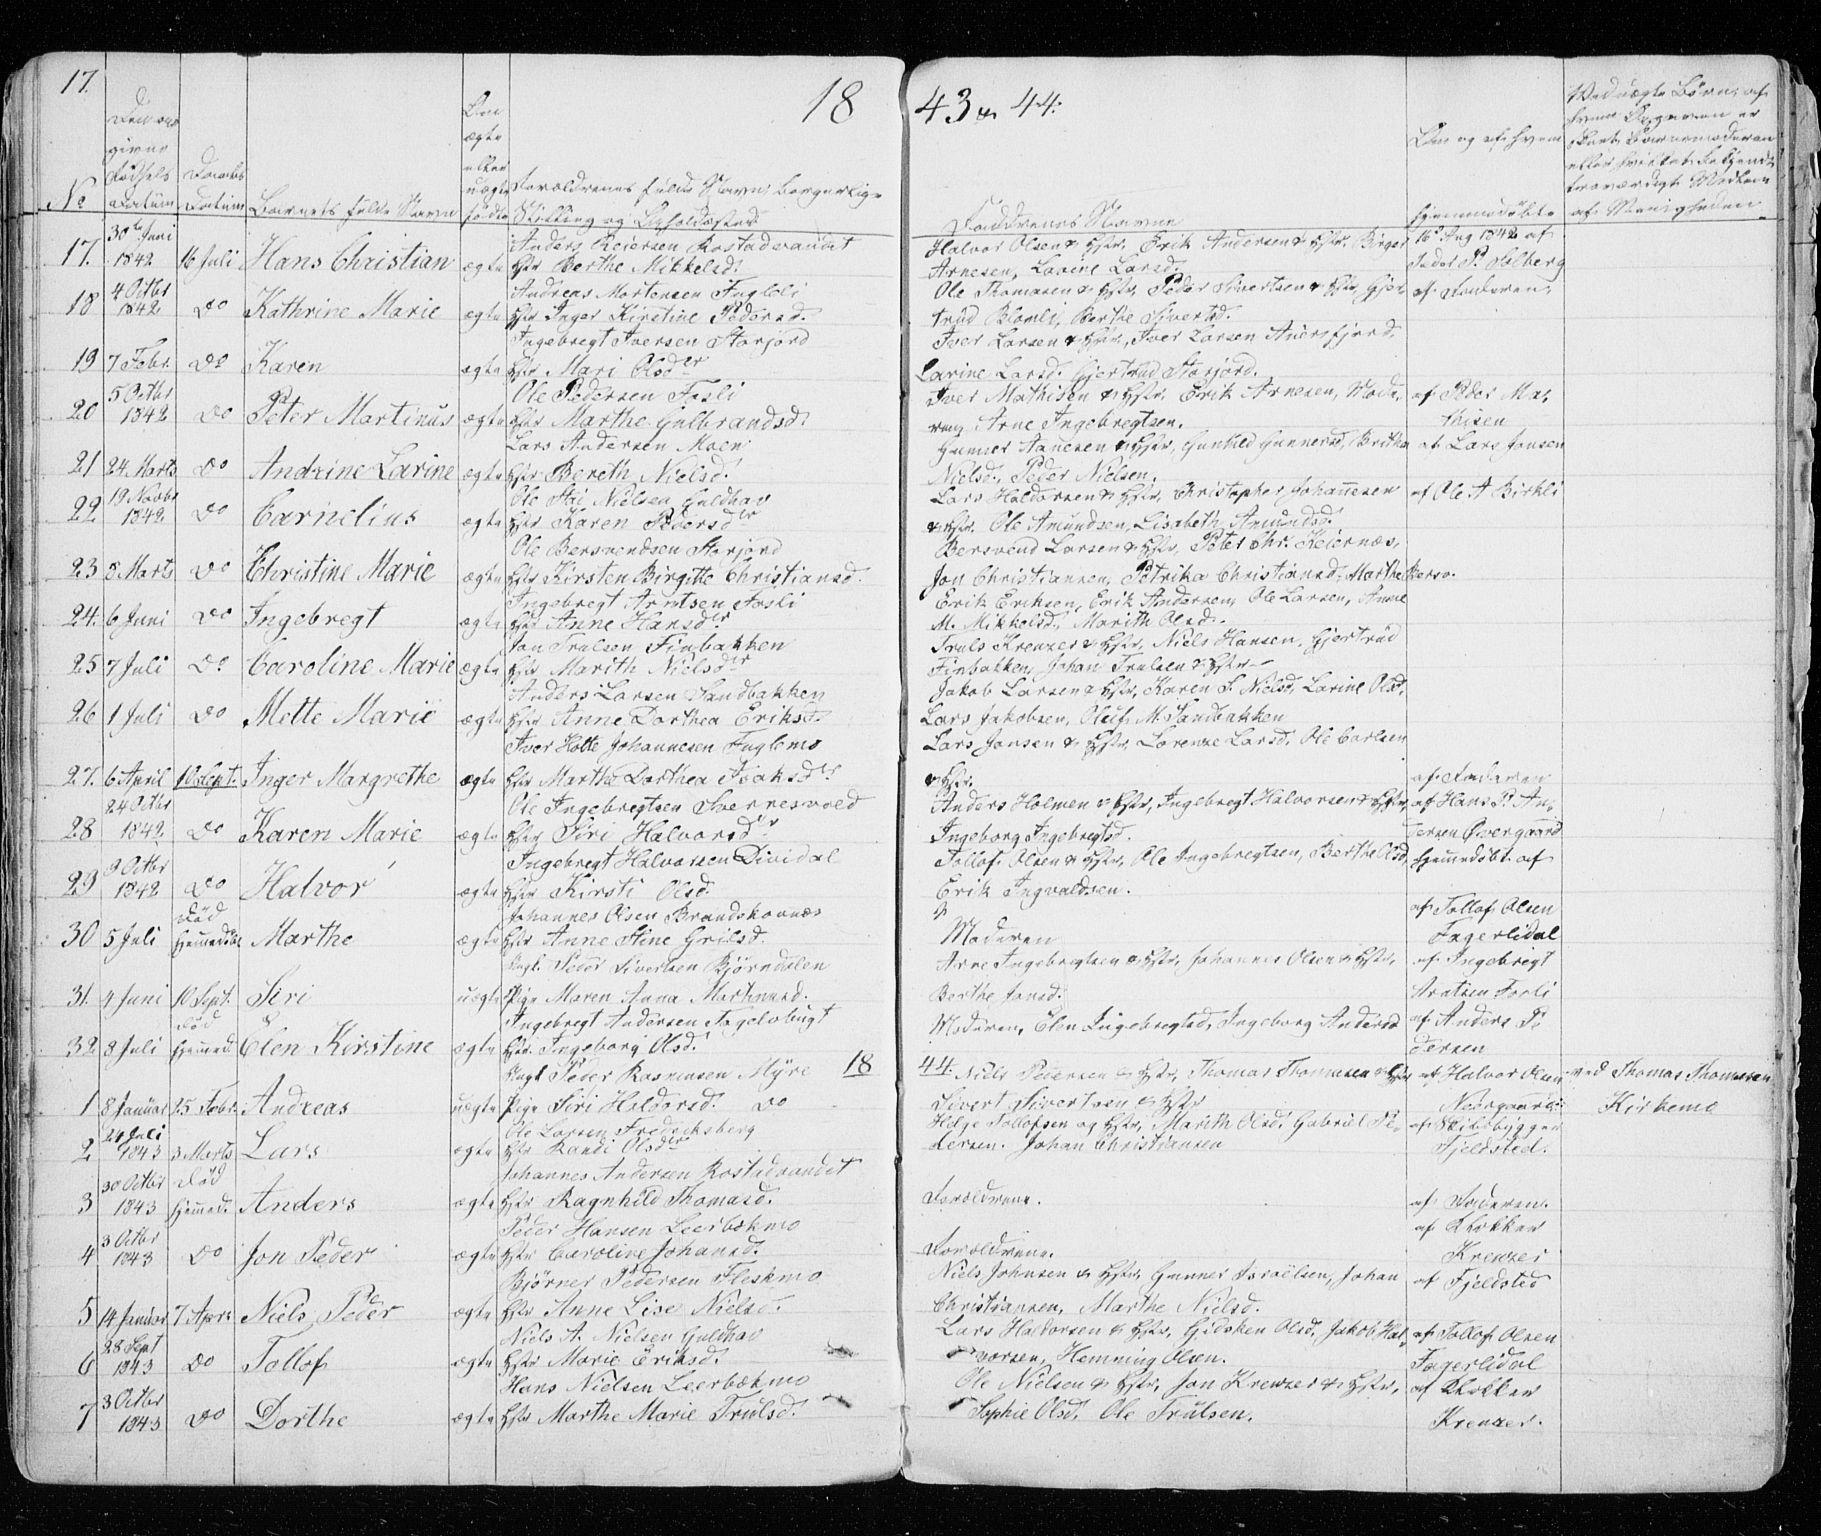 SATØ, Målselv sokneprestembete, G/Ga/Gaa/L0001kirke: Ministerialbok nr. 1, 1834-1853, s. 17